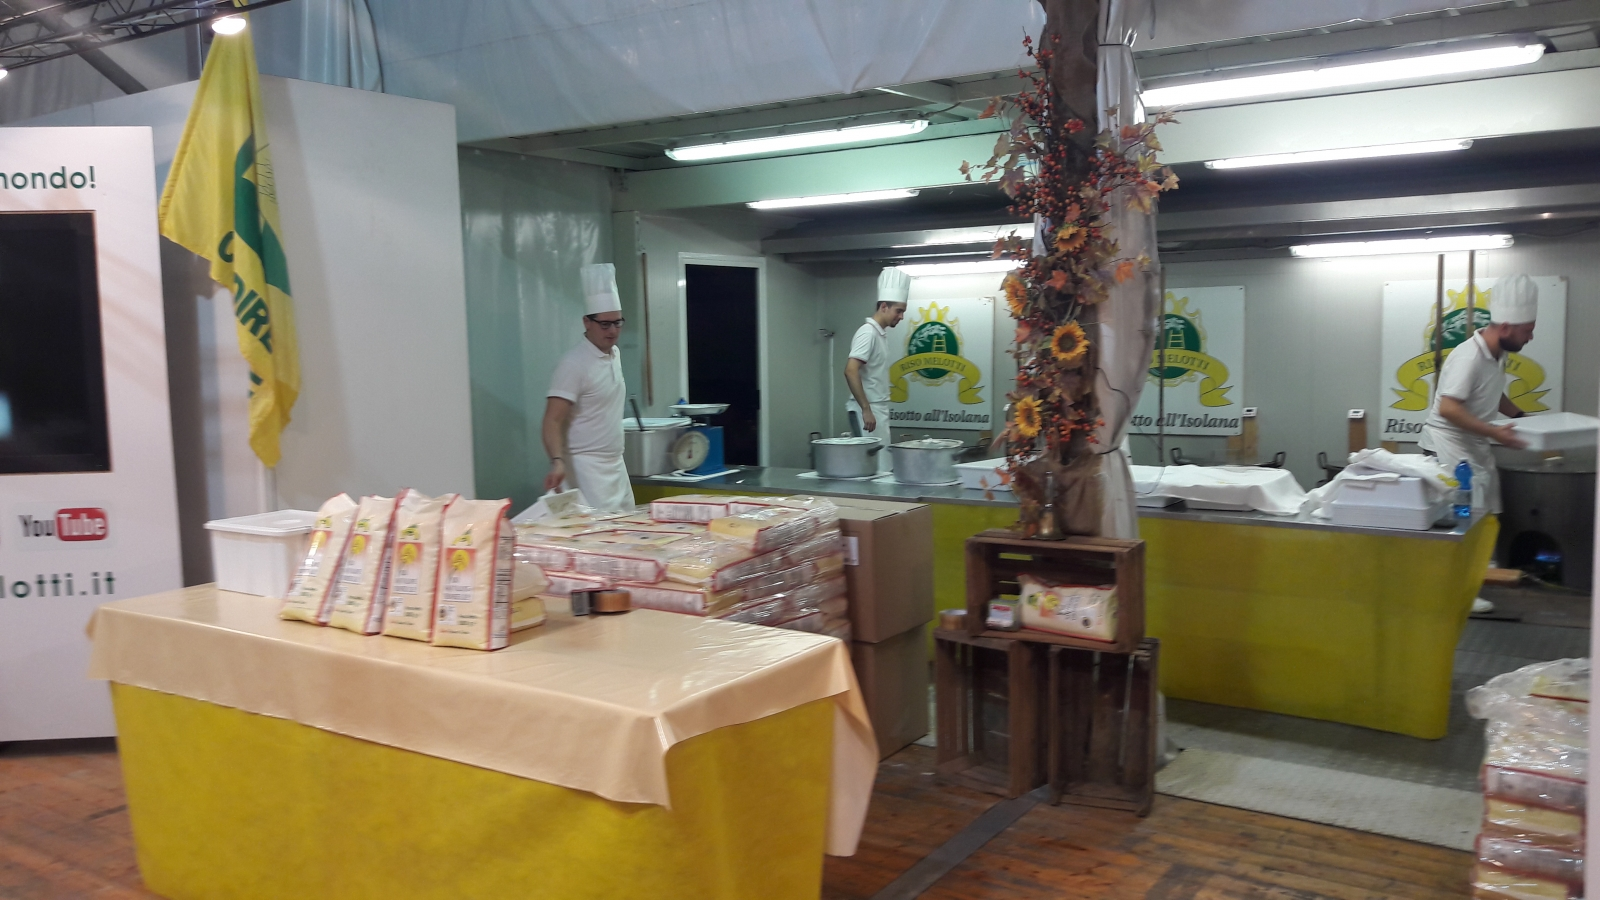 Reisfest in Isola (6)